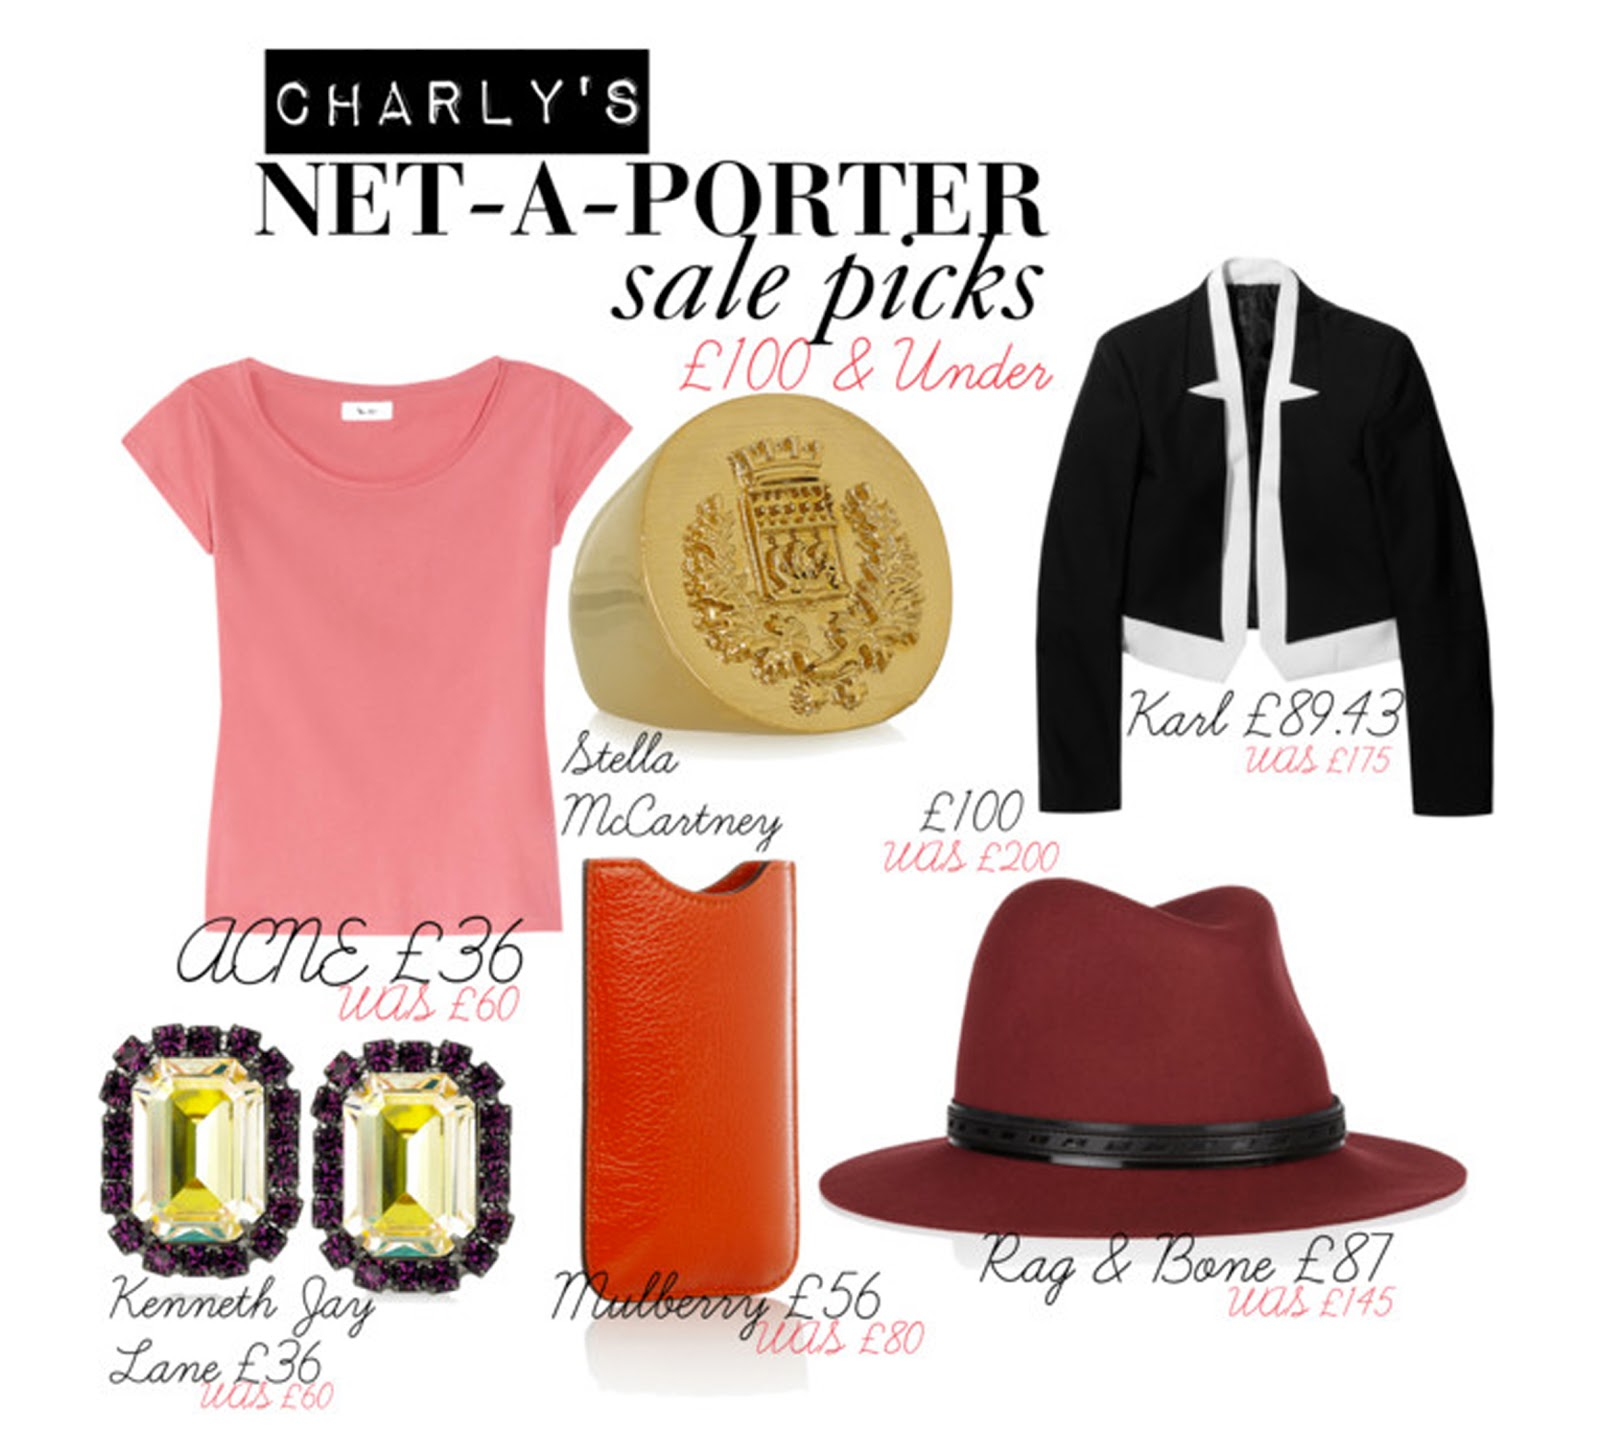 http://3.bp.blogspot.com/-jnMrzQqAbSE/UOCcTc7W3hI/AAAAAAAAArs/60MToNhY96U/s1600/net+a+porter+sale+picks.jpg